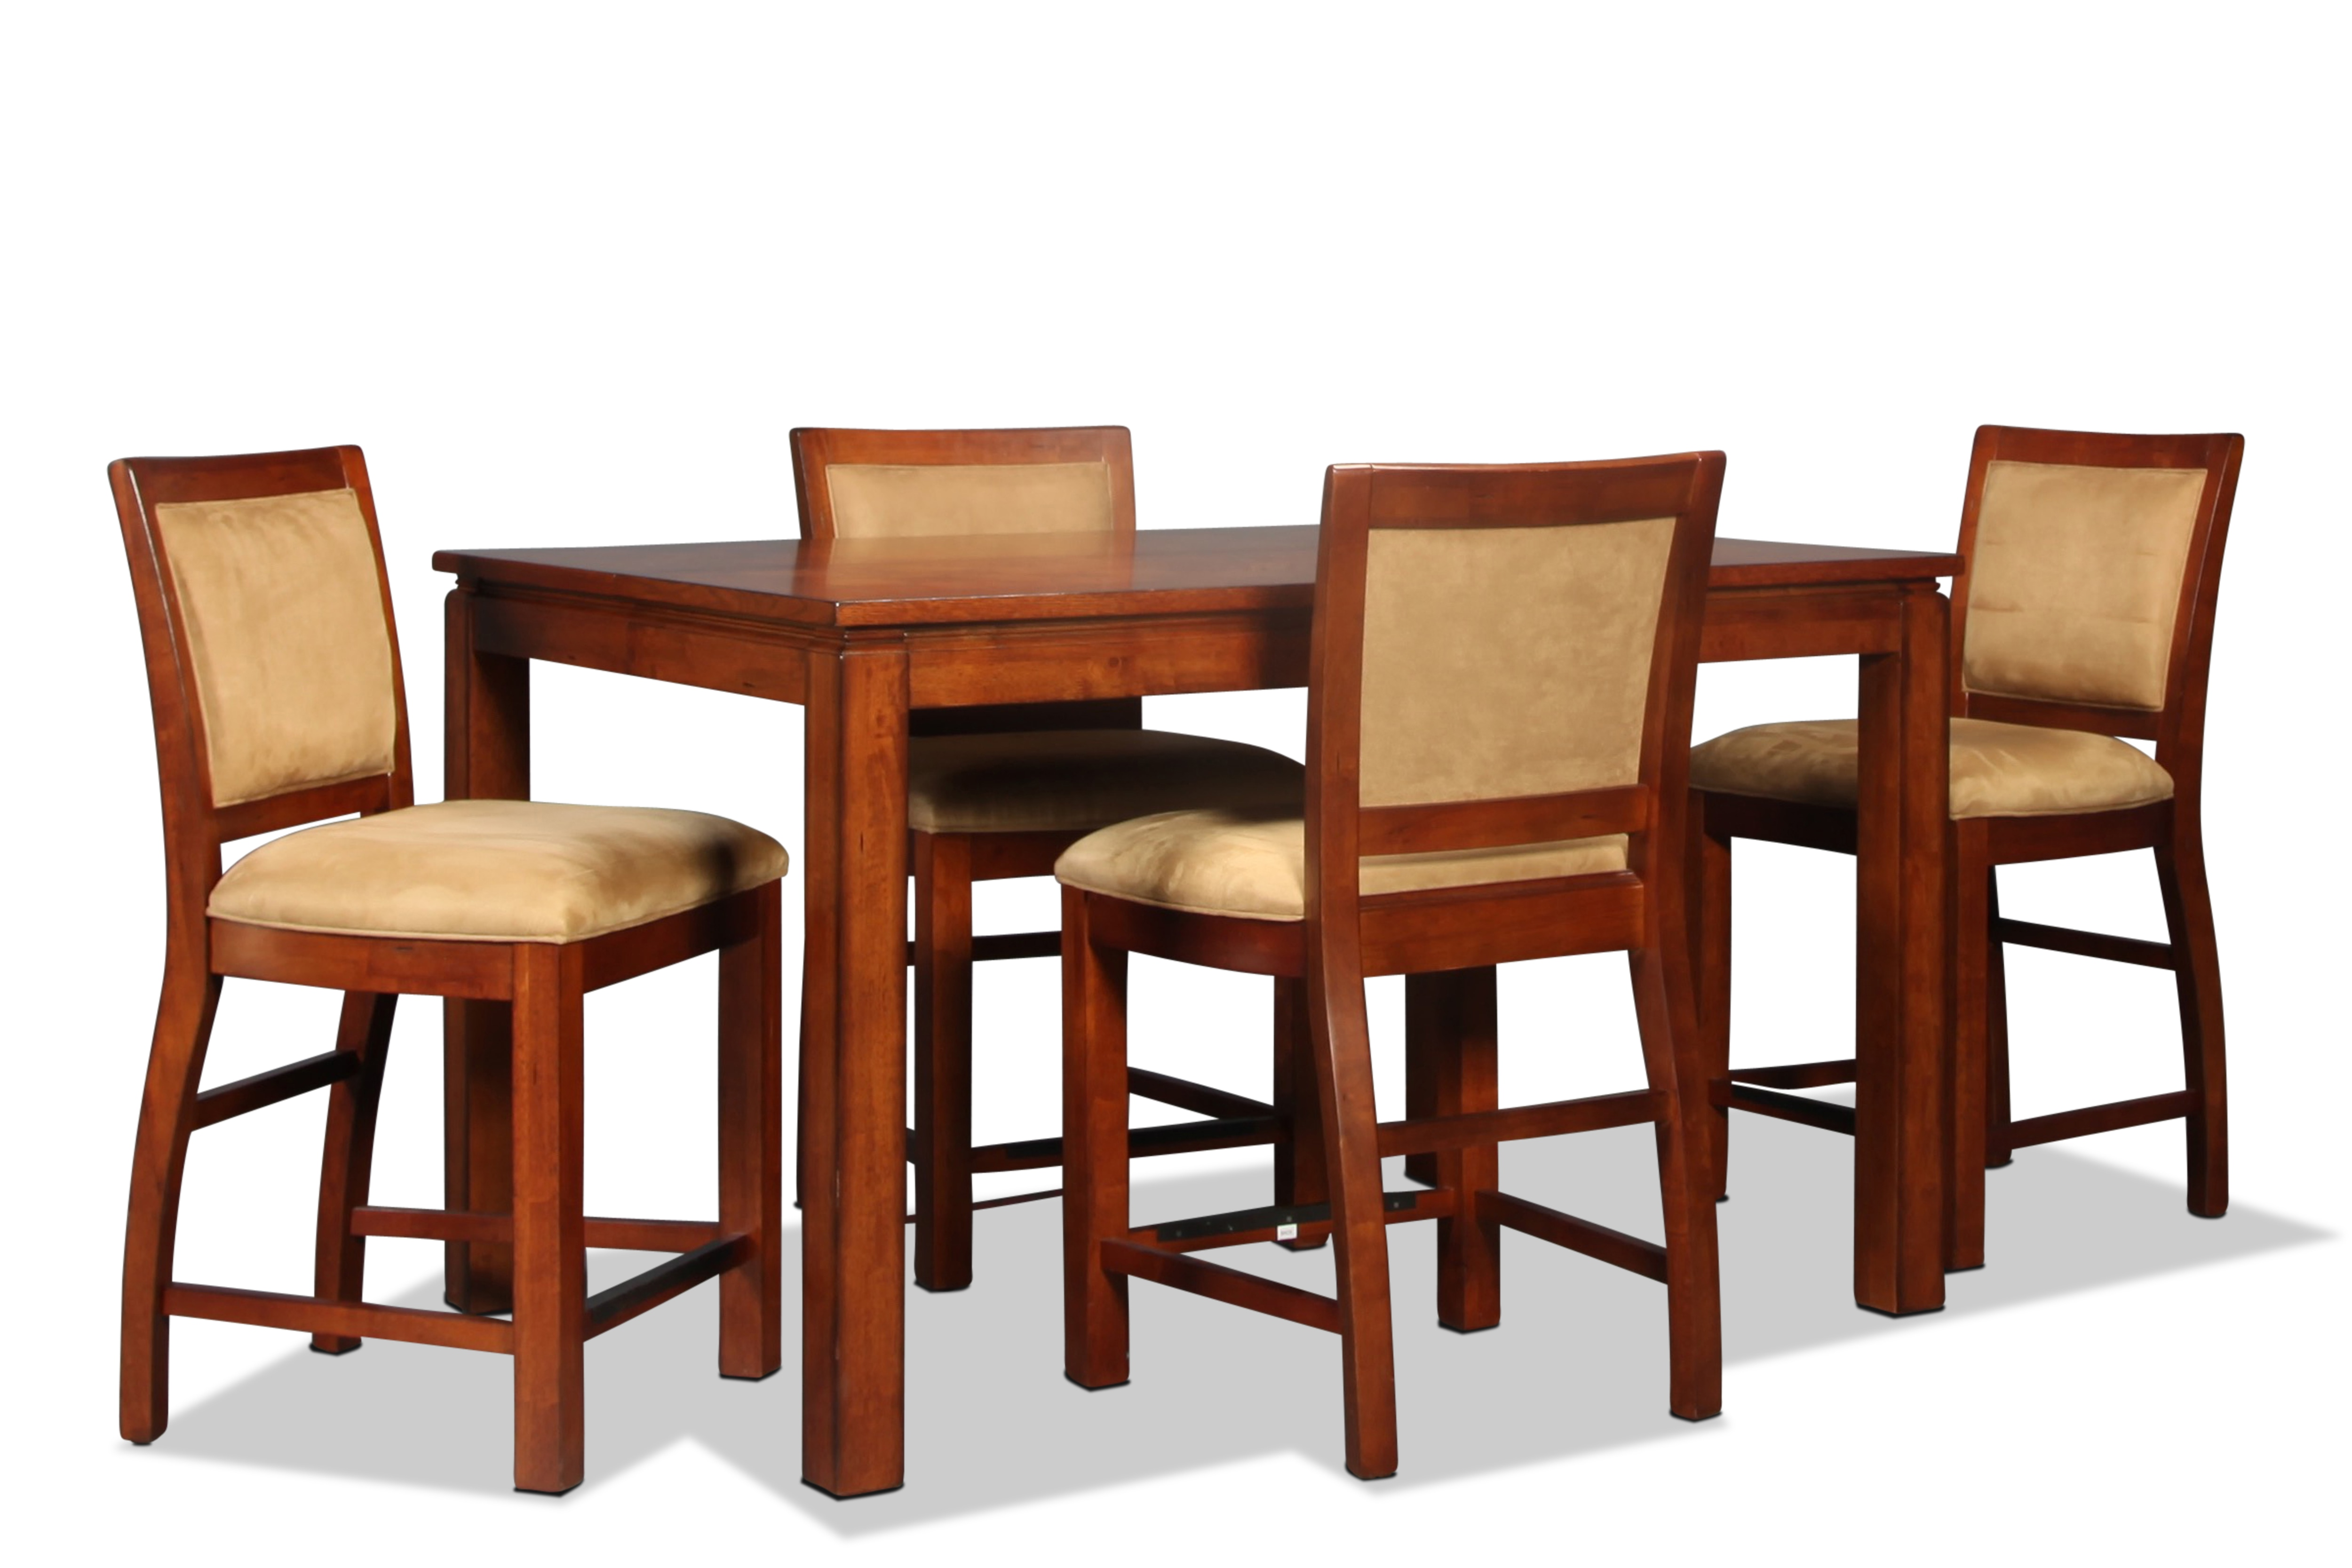 Woodbridge Pub Table and 4 Pub Chairs - Mocha